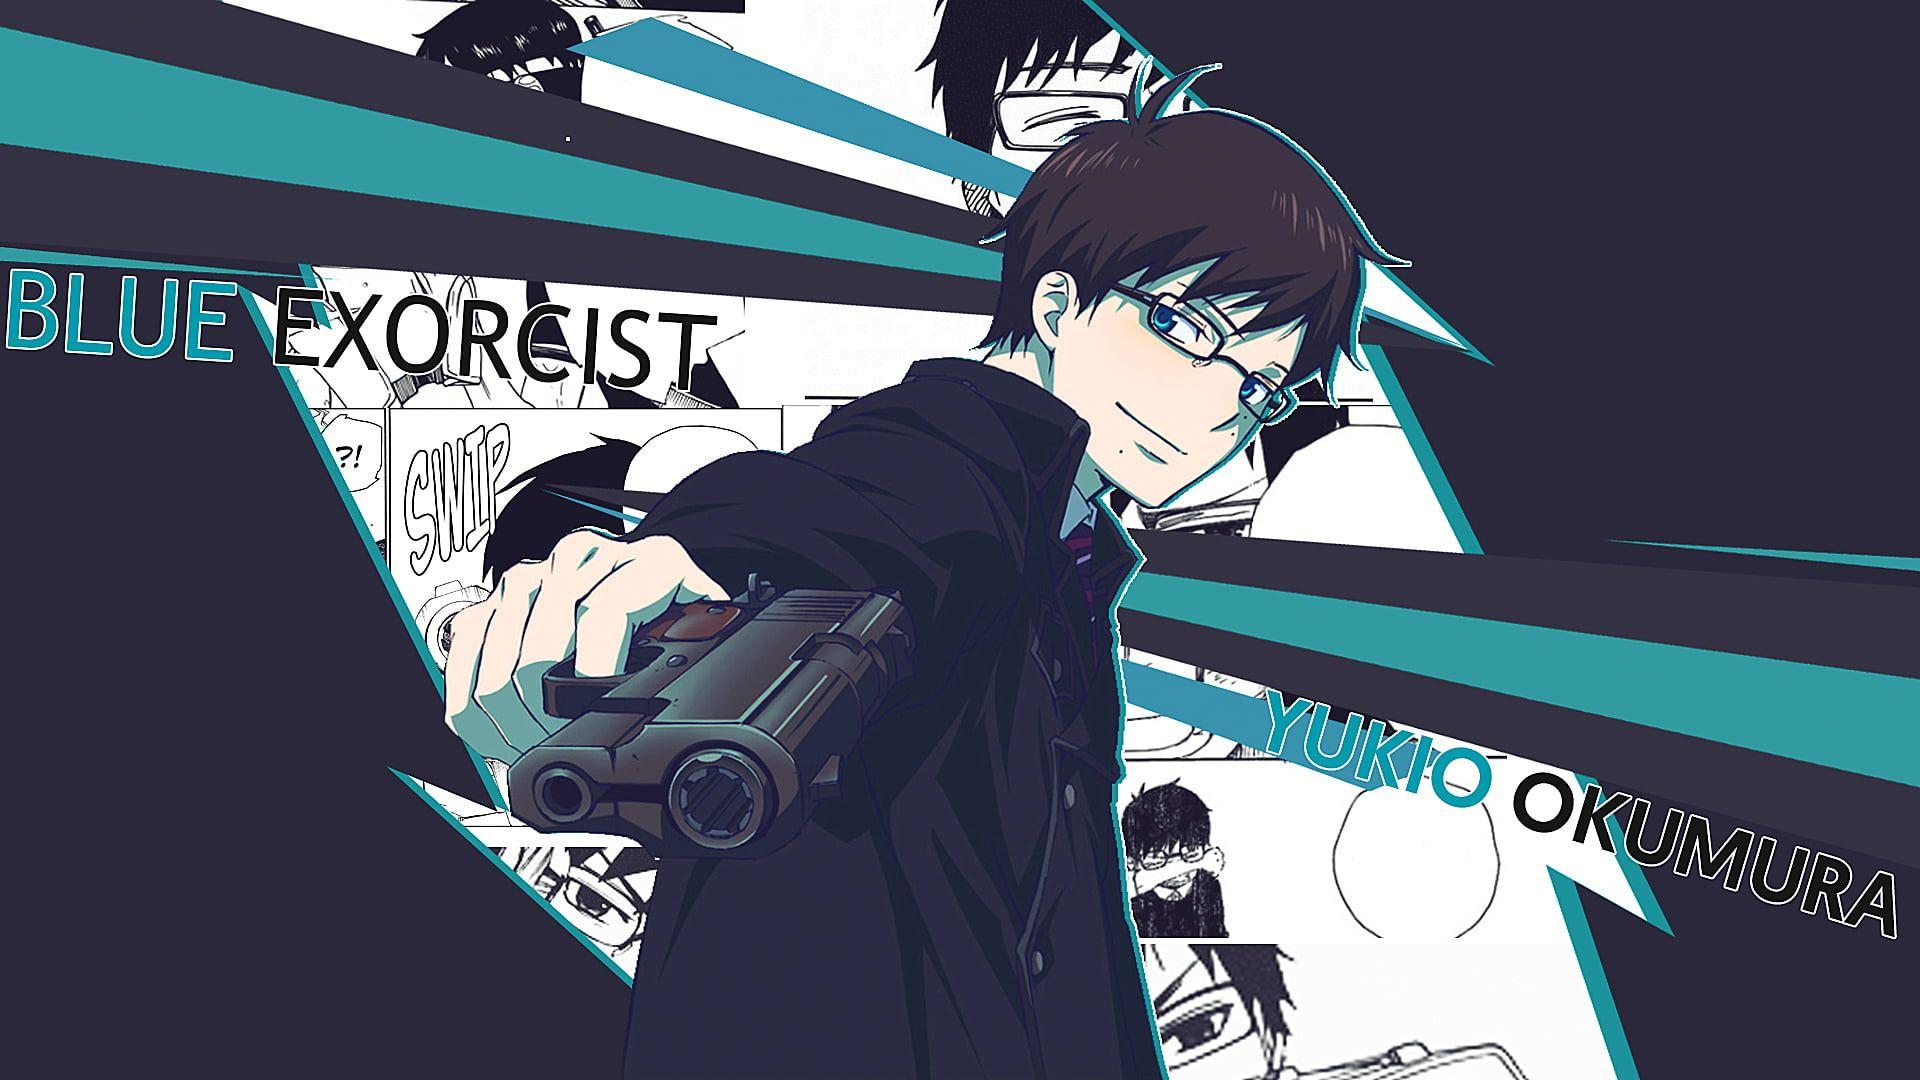 Blue Exorcist Okumura Yukio 1080p Wallpaper Hdwallpaper Desktop Blue Exorcist Blue Exorcist Characters Blue Anime